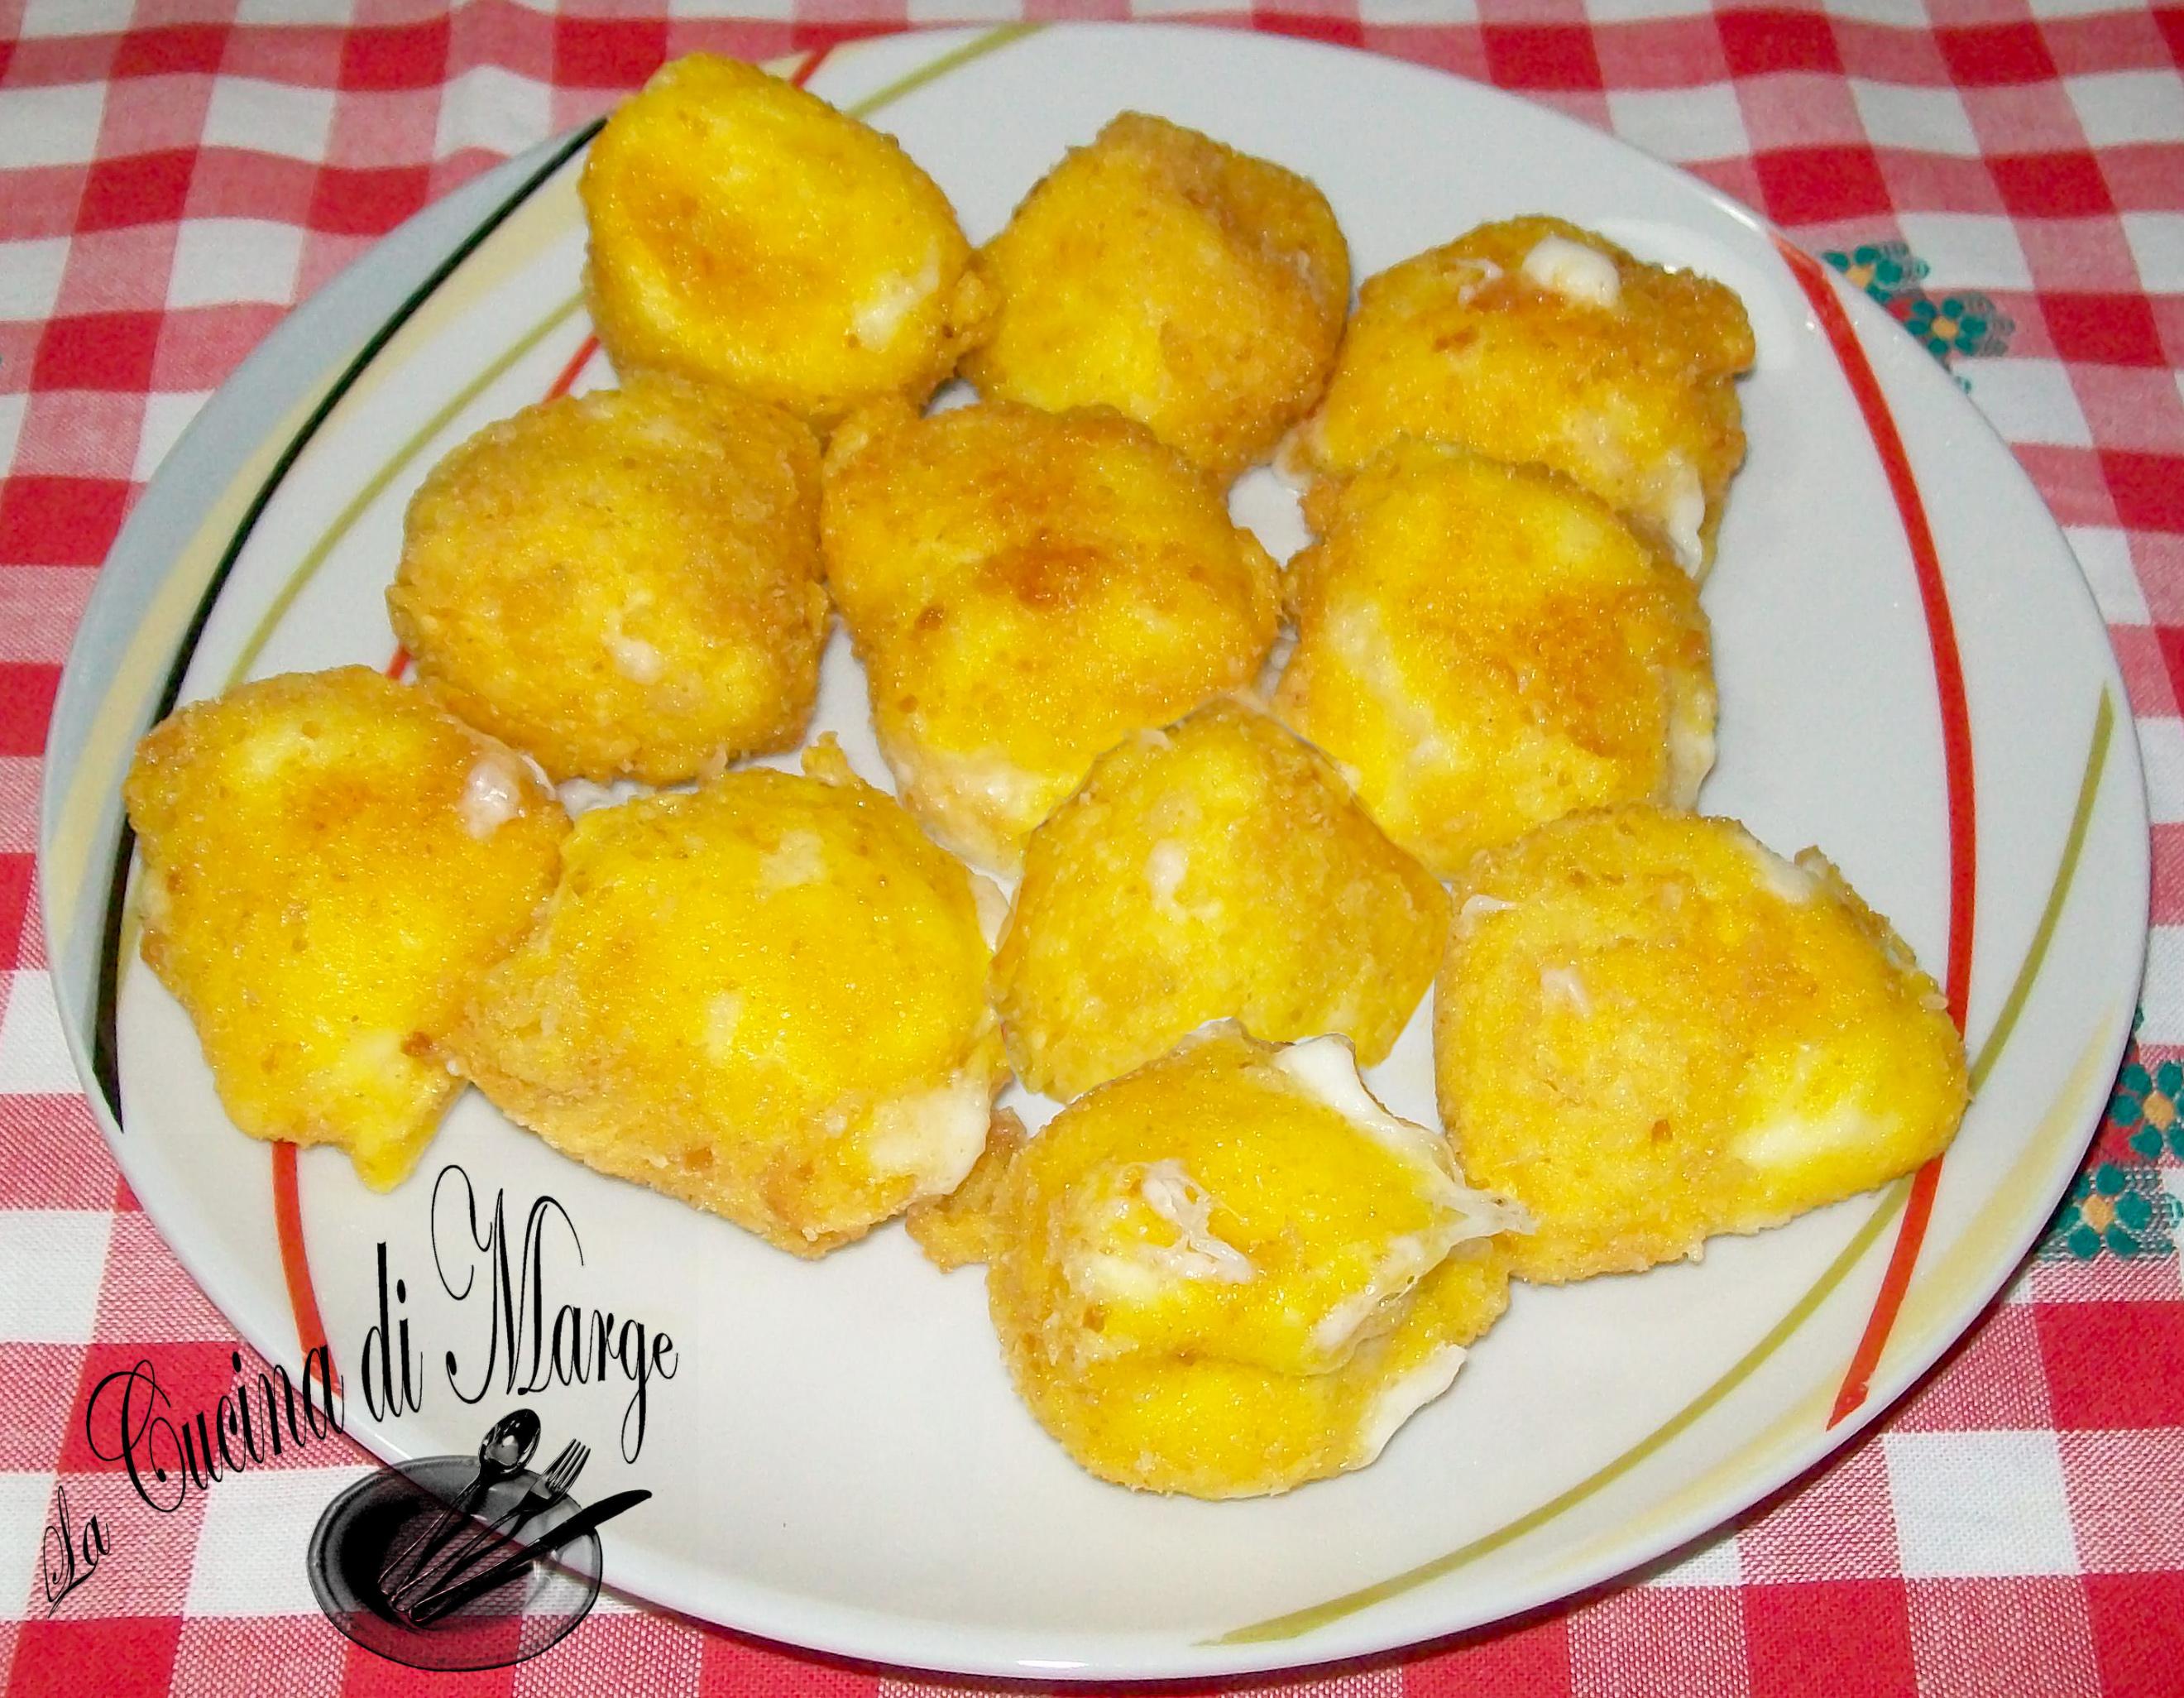 Mozzarella fritta ricetta facile lacucinadimarge for Cucina facile ricette